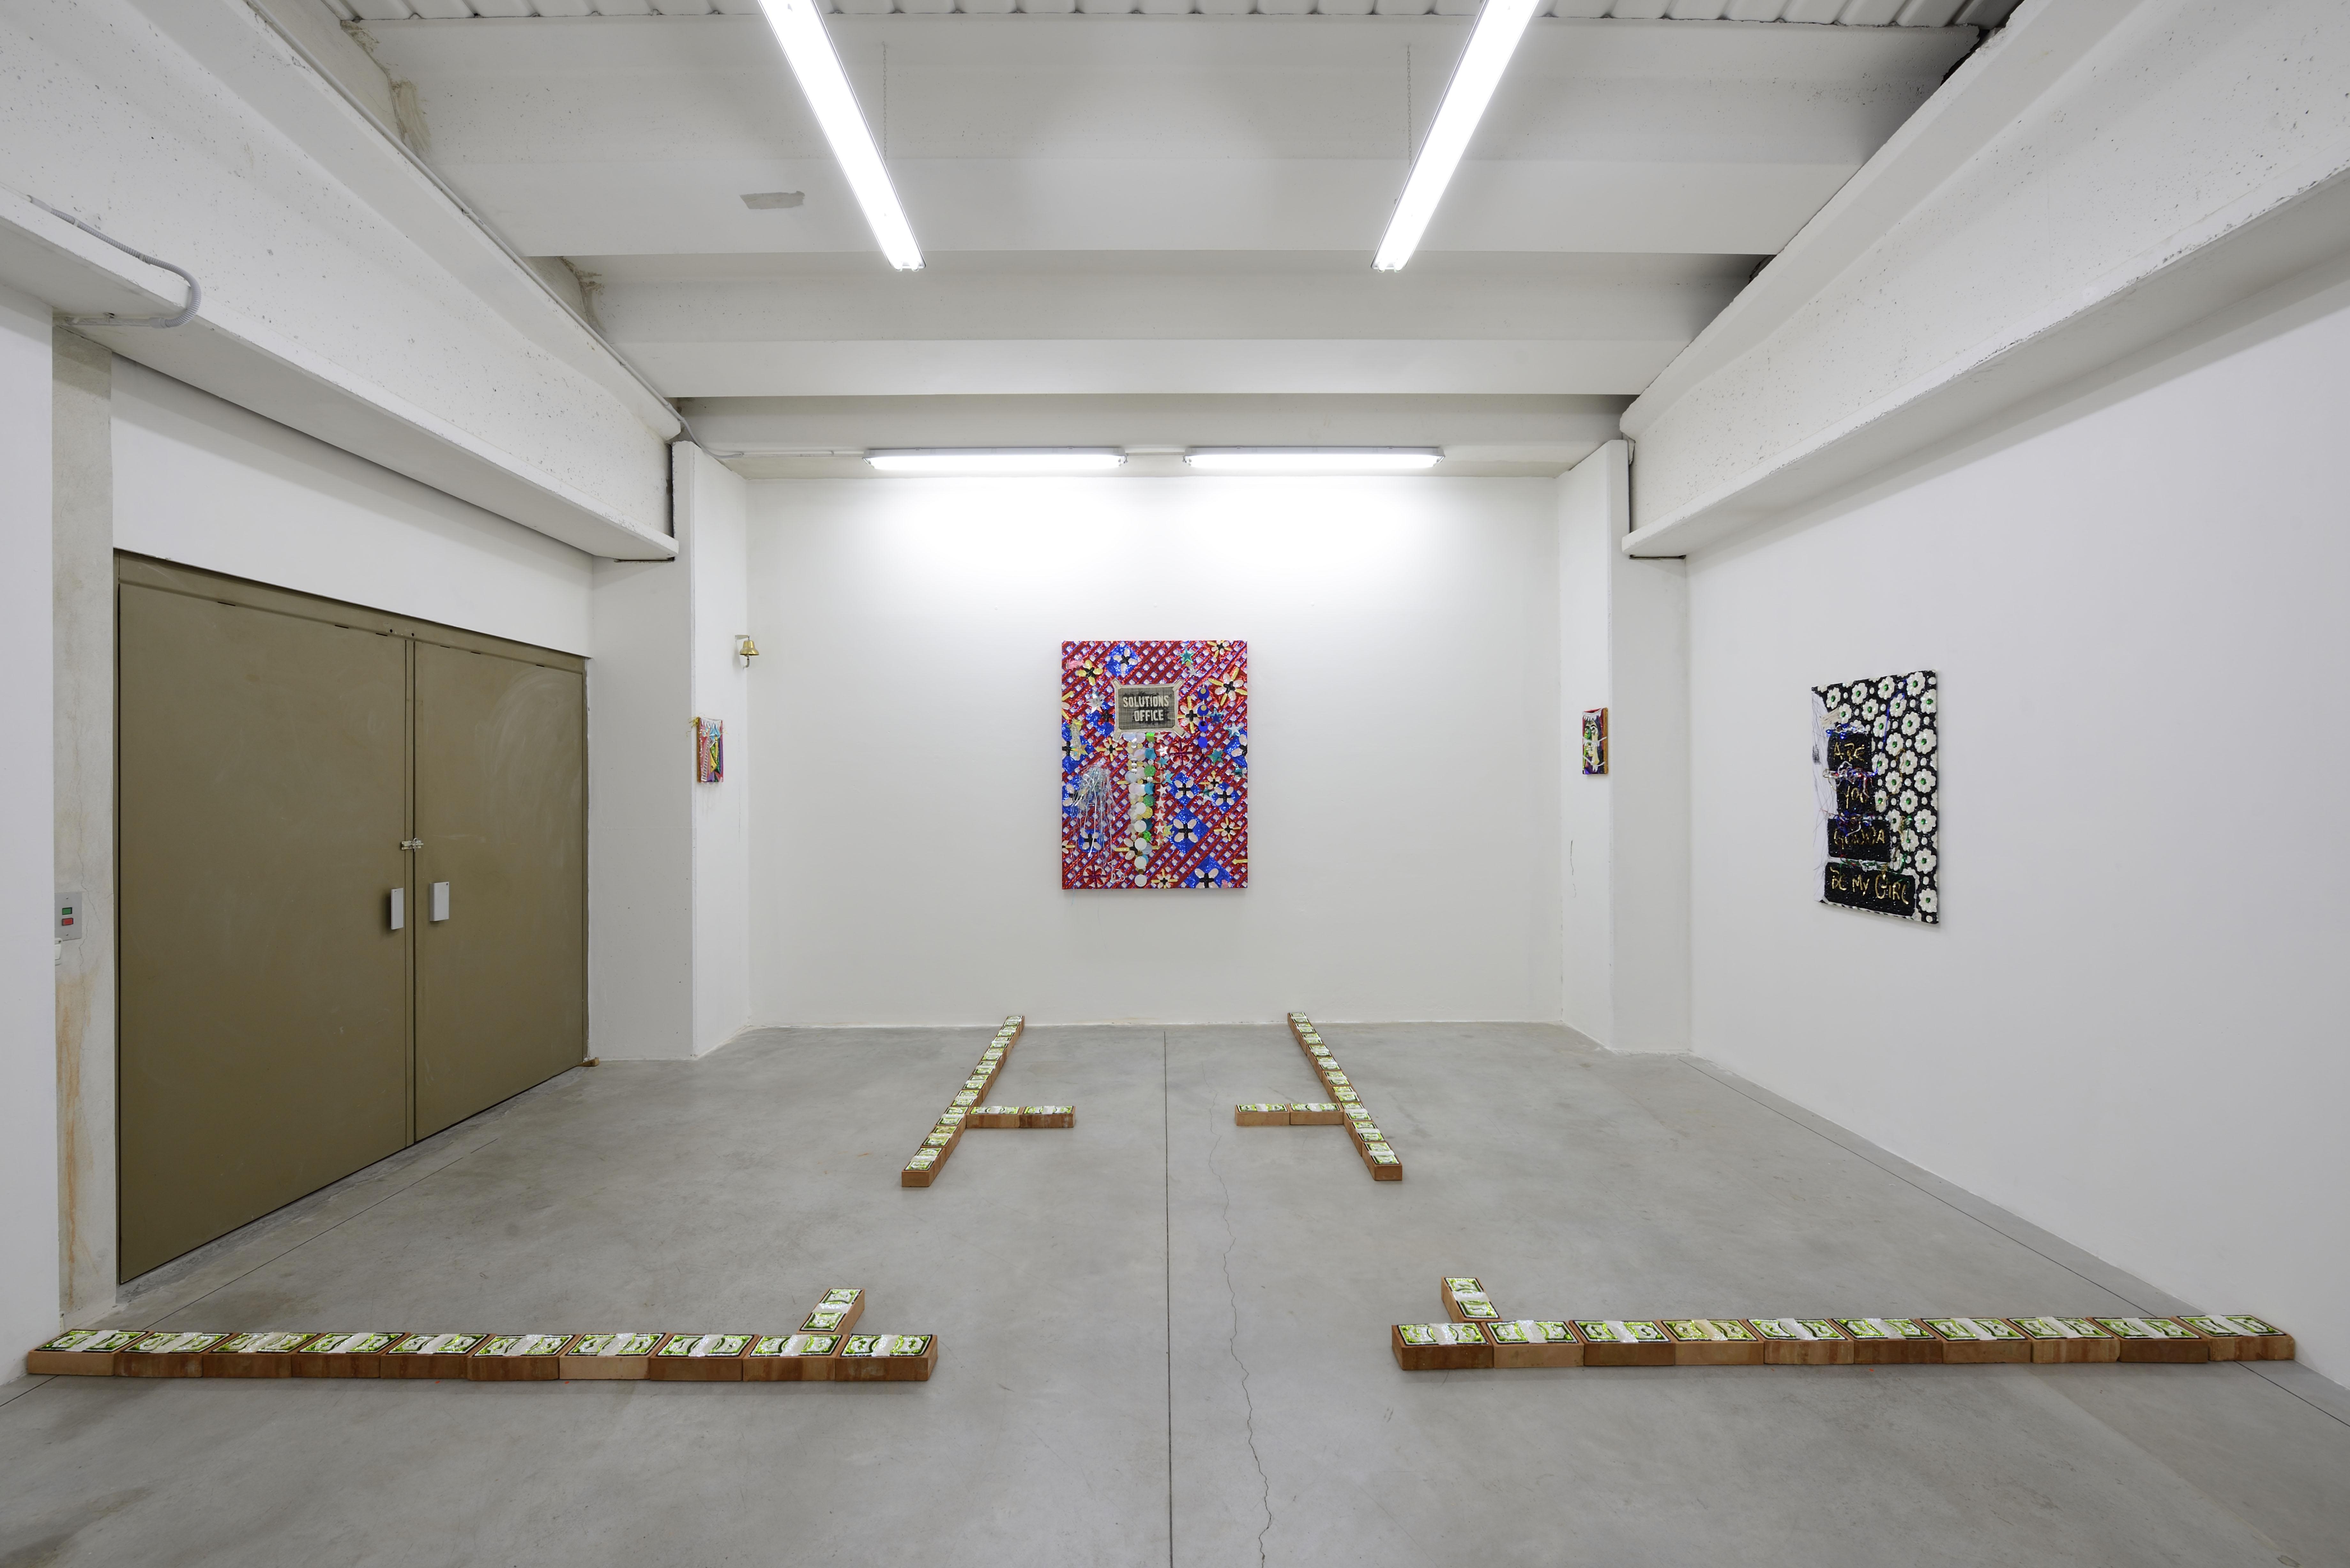 Daniel González, 26mq Solution's Office, mostra personale, Boccanera Gallery, Trento, 2018